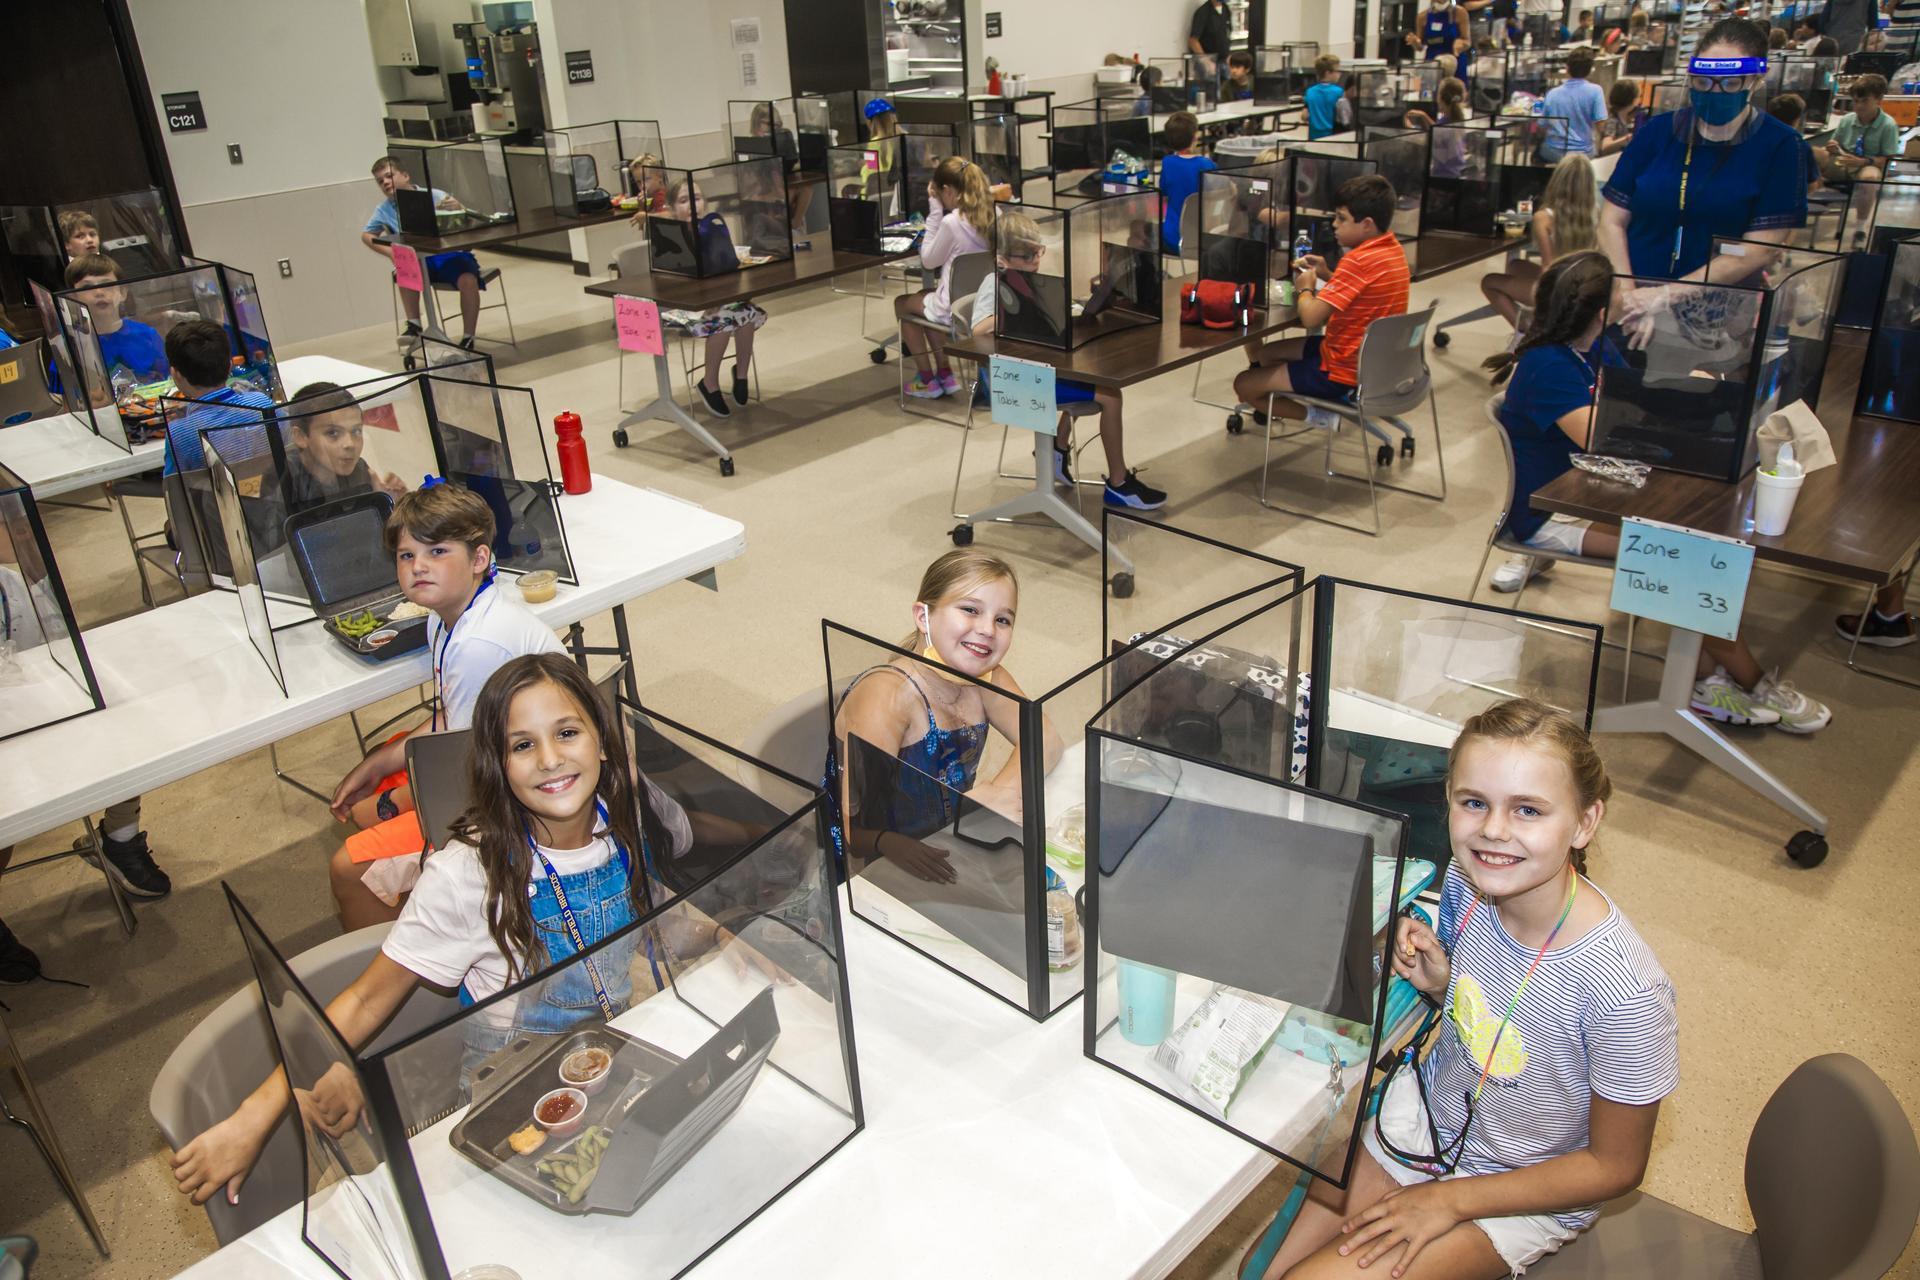 Bradfield Elementary Cafeteria